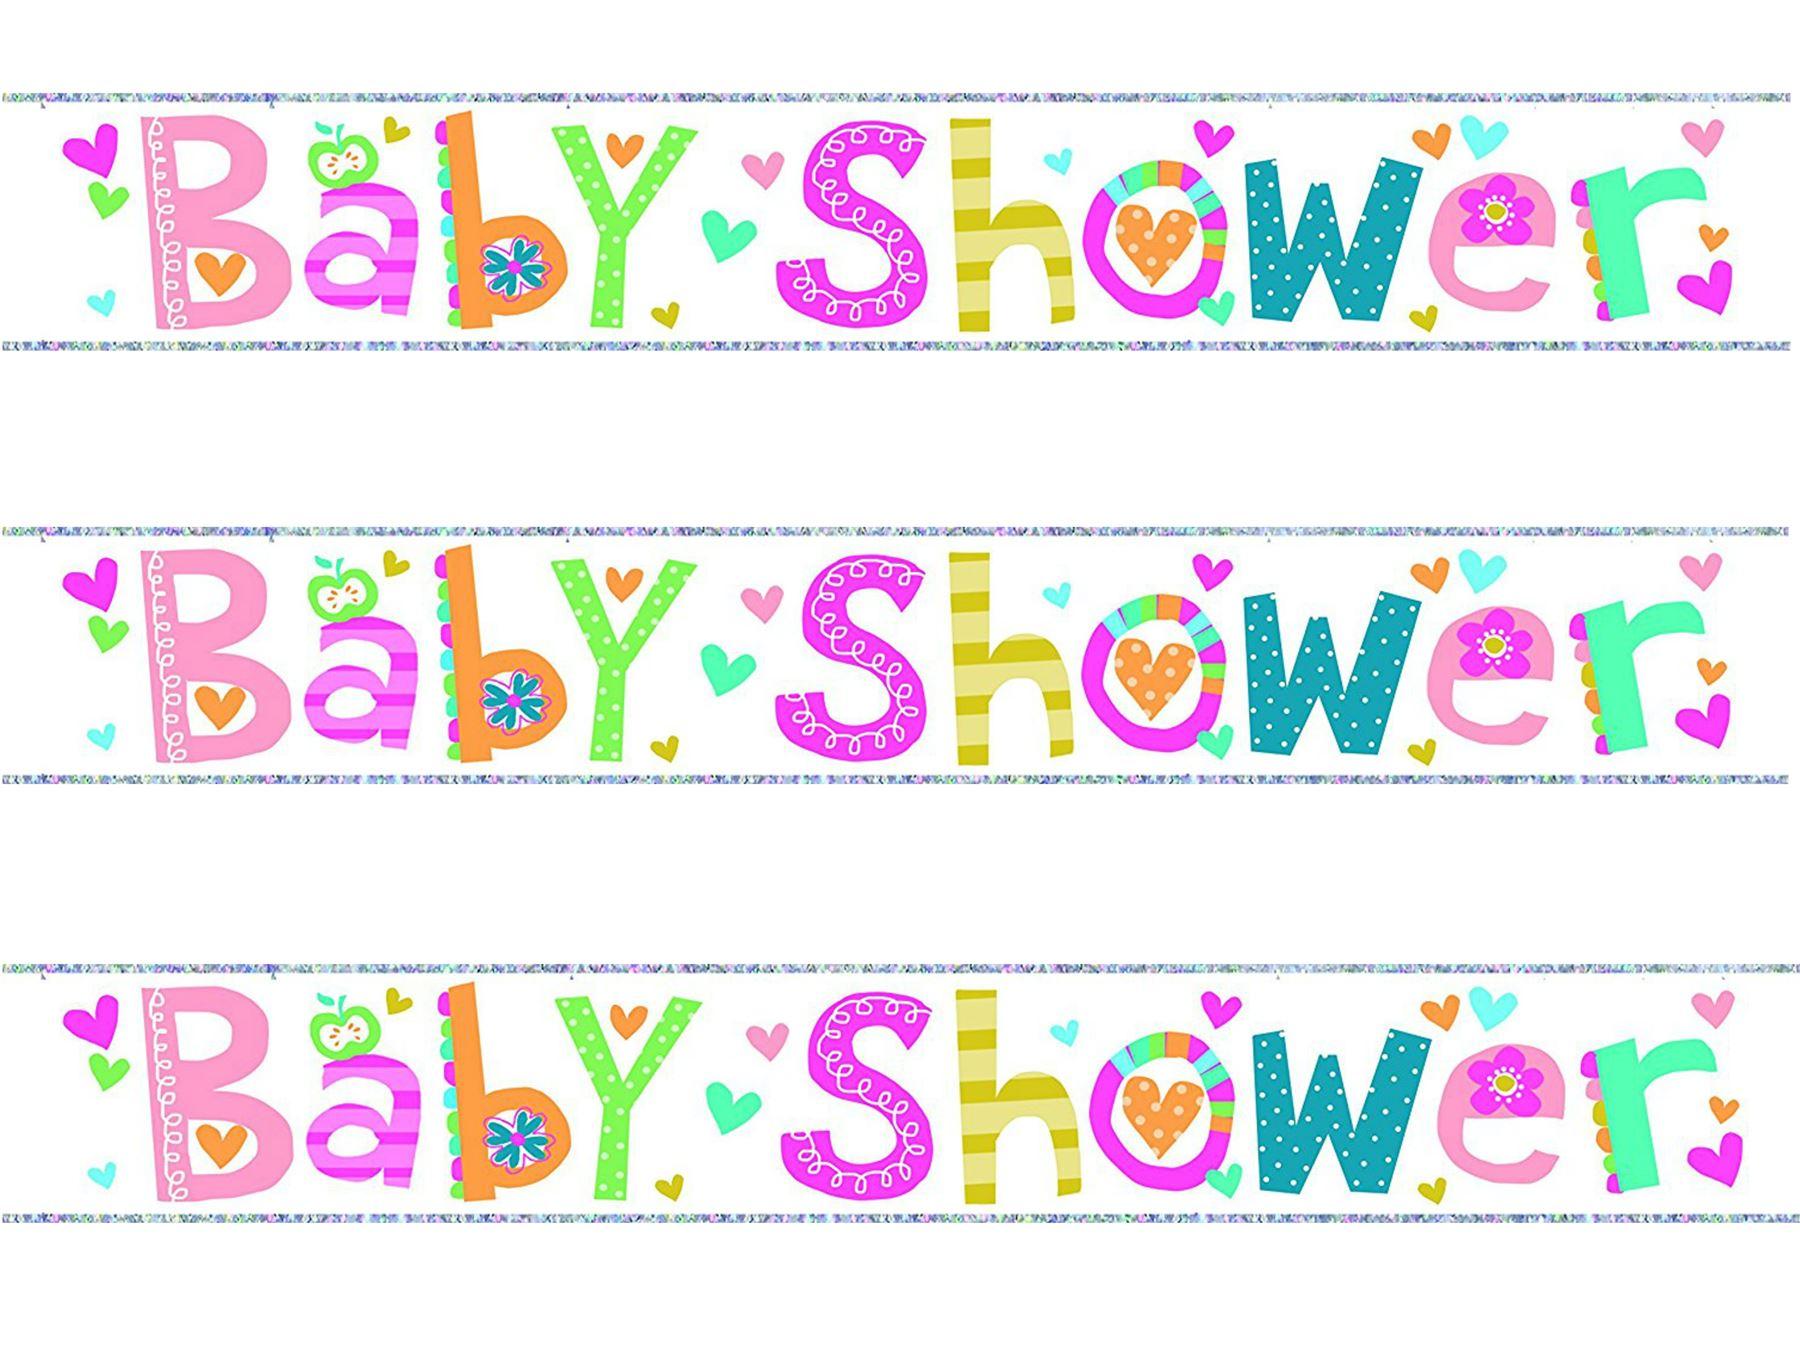 Rosa-Baby-Shower-Pancarta-nina-Decoracion-Fiesta-metalizado-articulado-Guirnalda